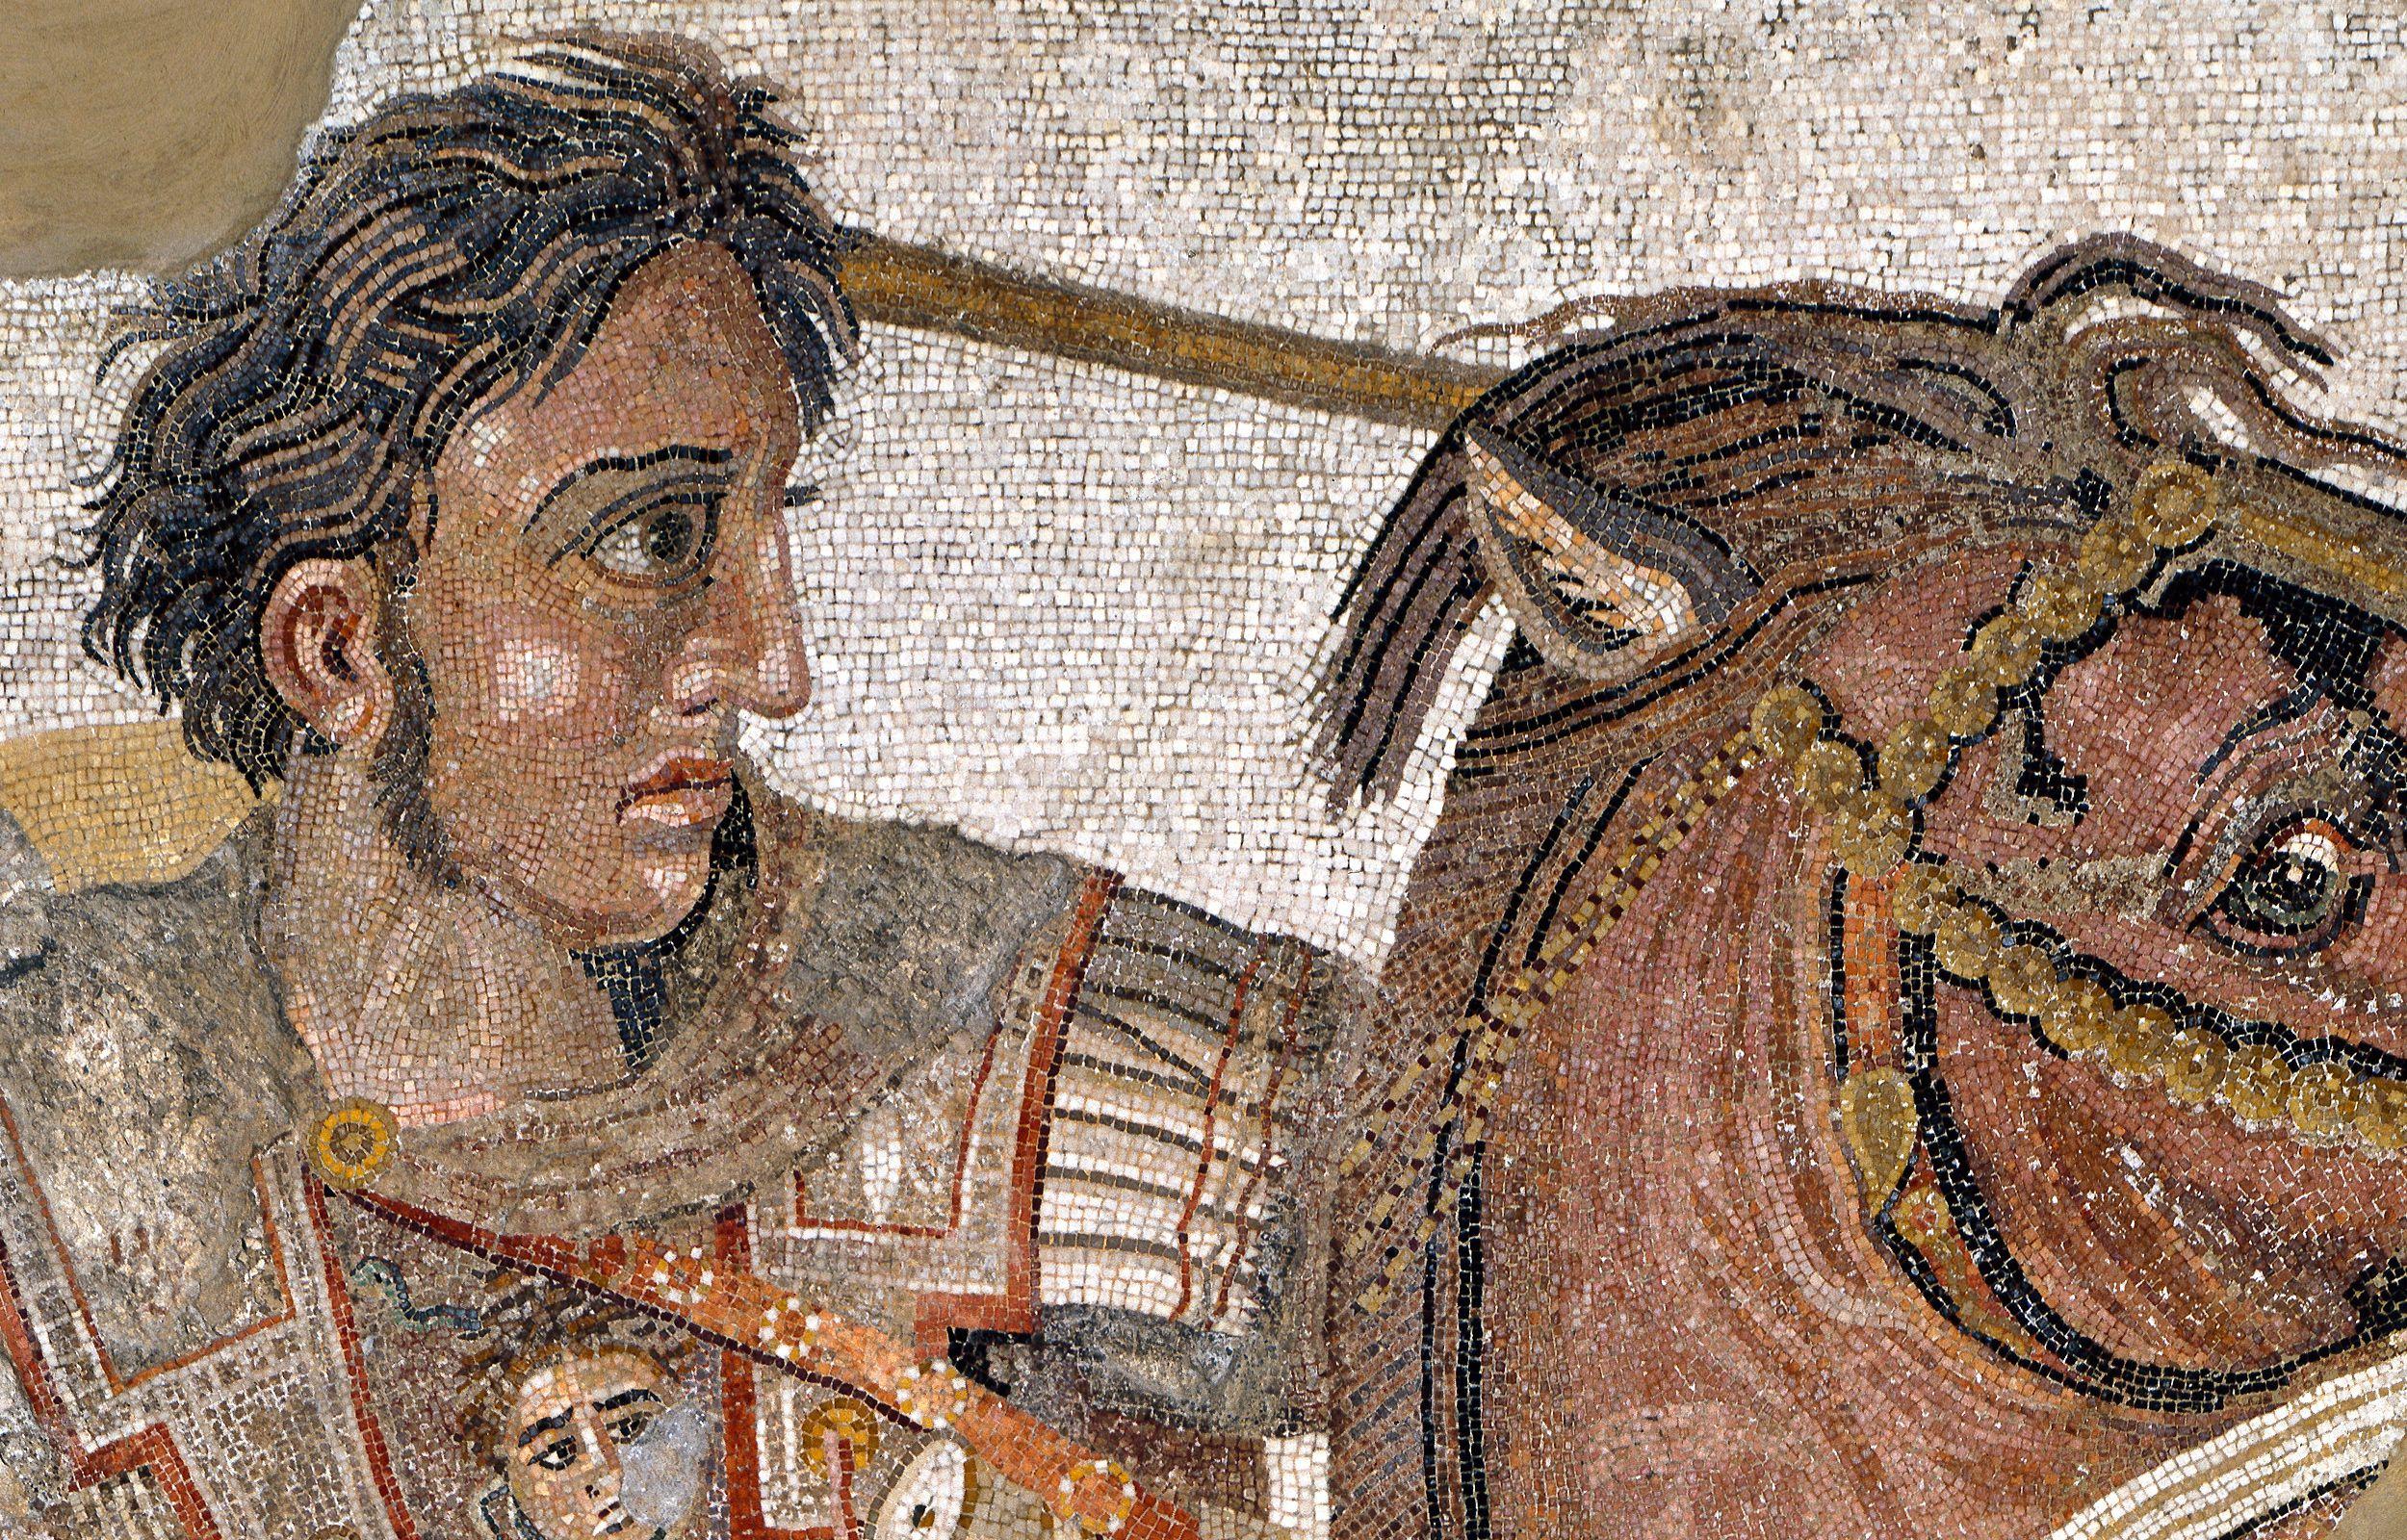 Roman Mosaics - Ancient Art in Tiny Pieces